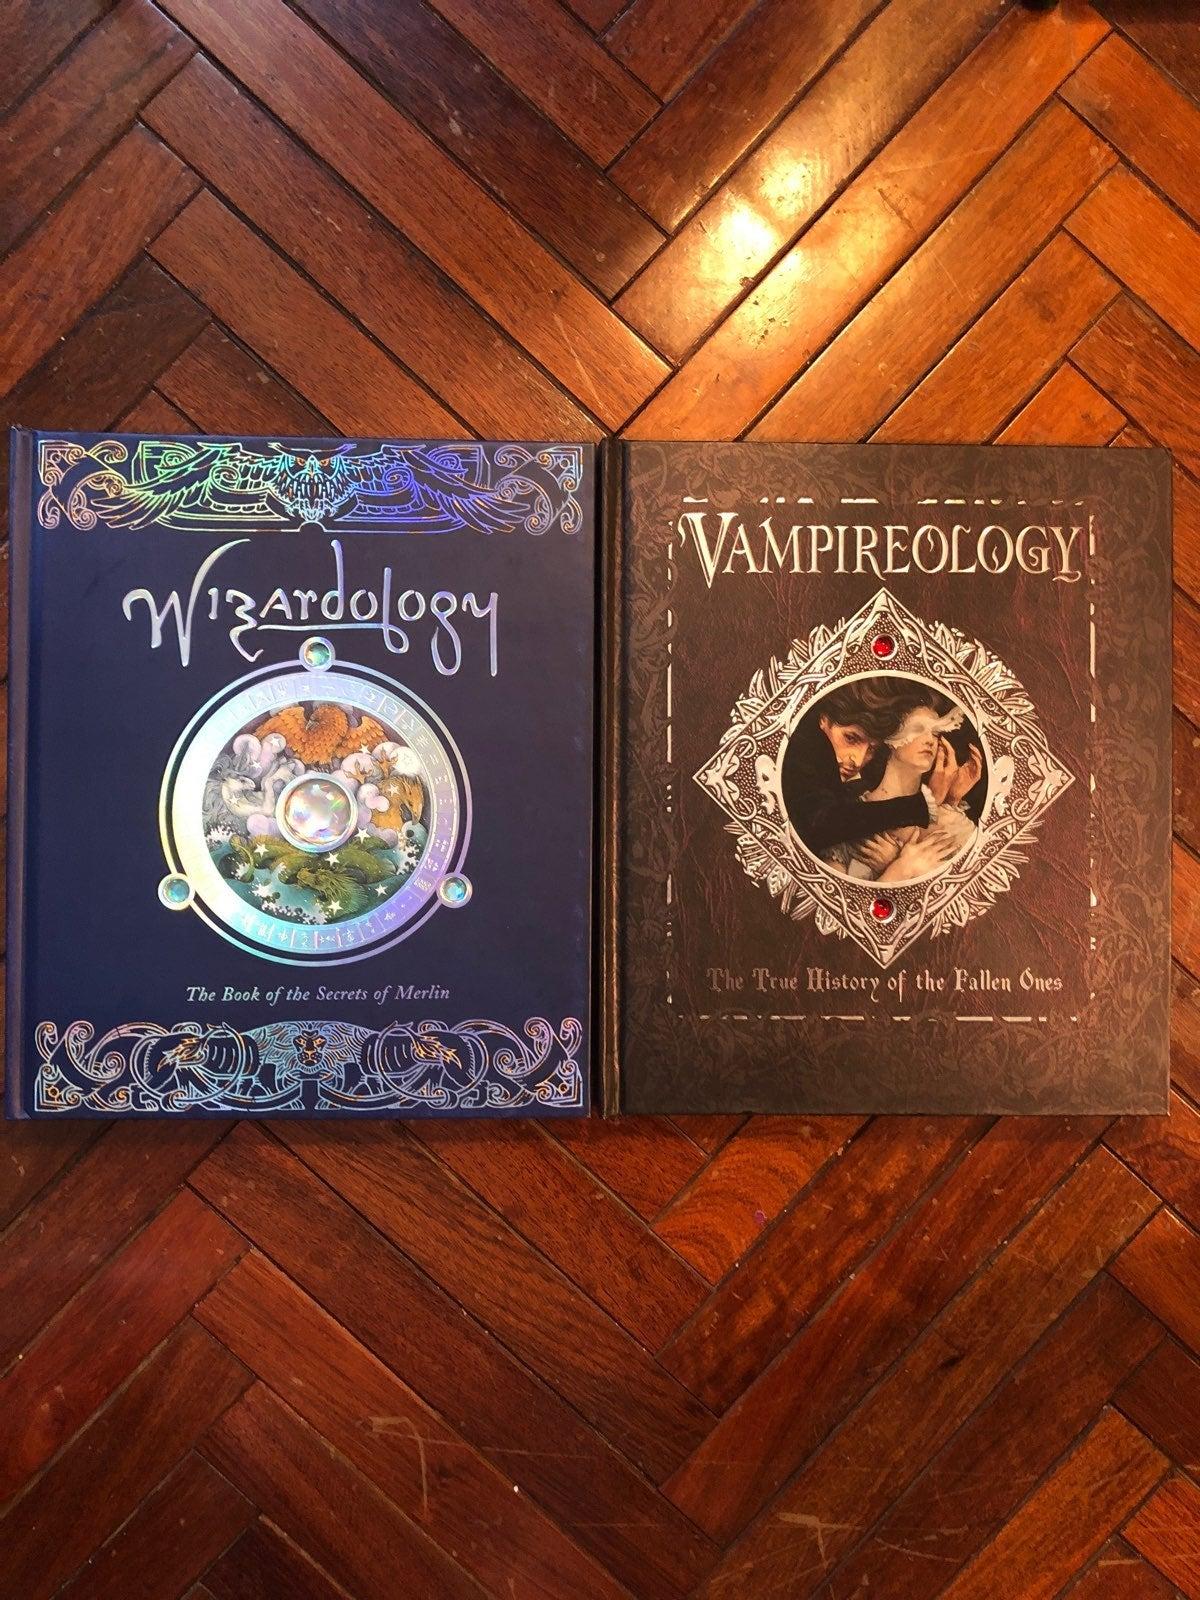 Wizardology And Vampireology Books!